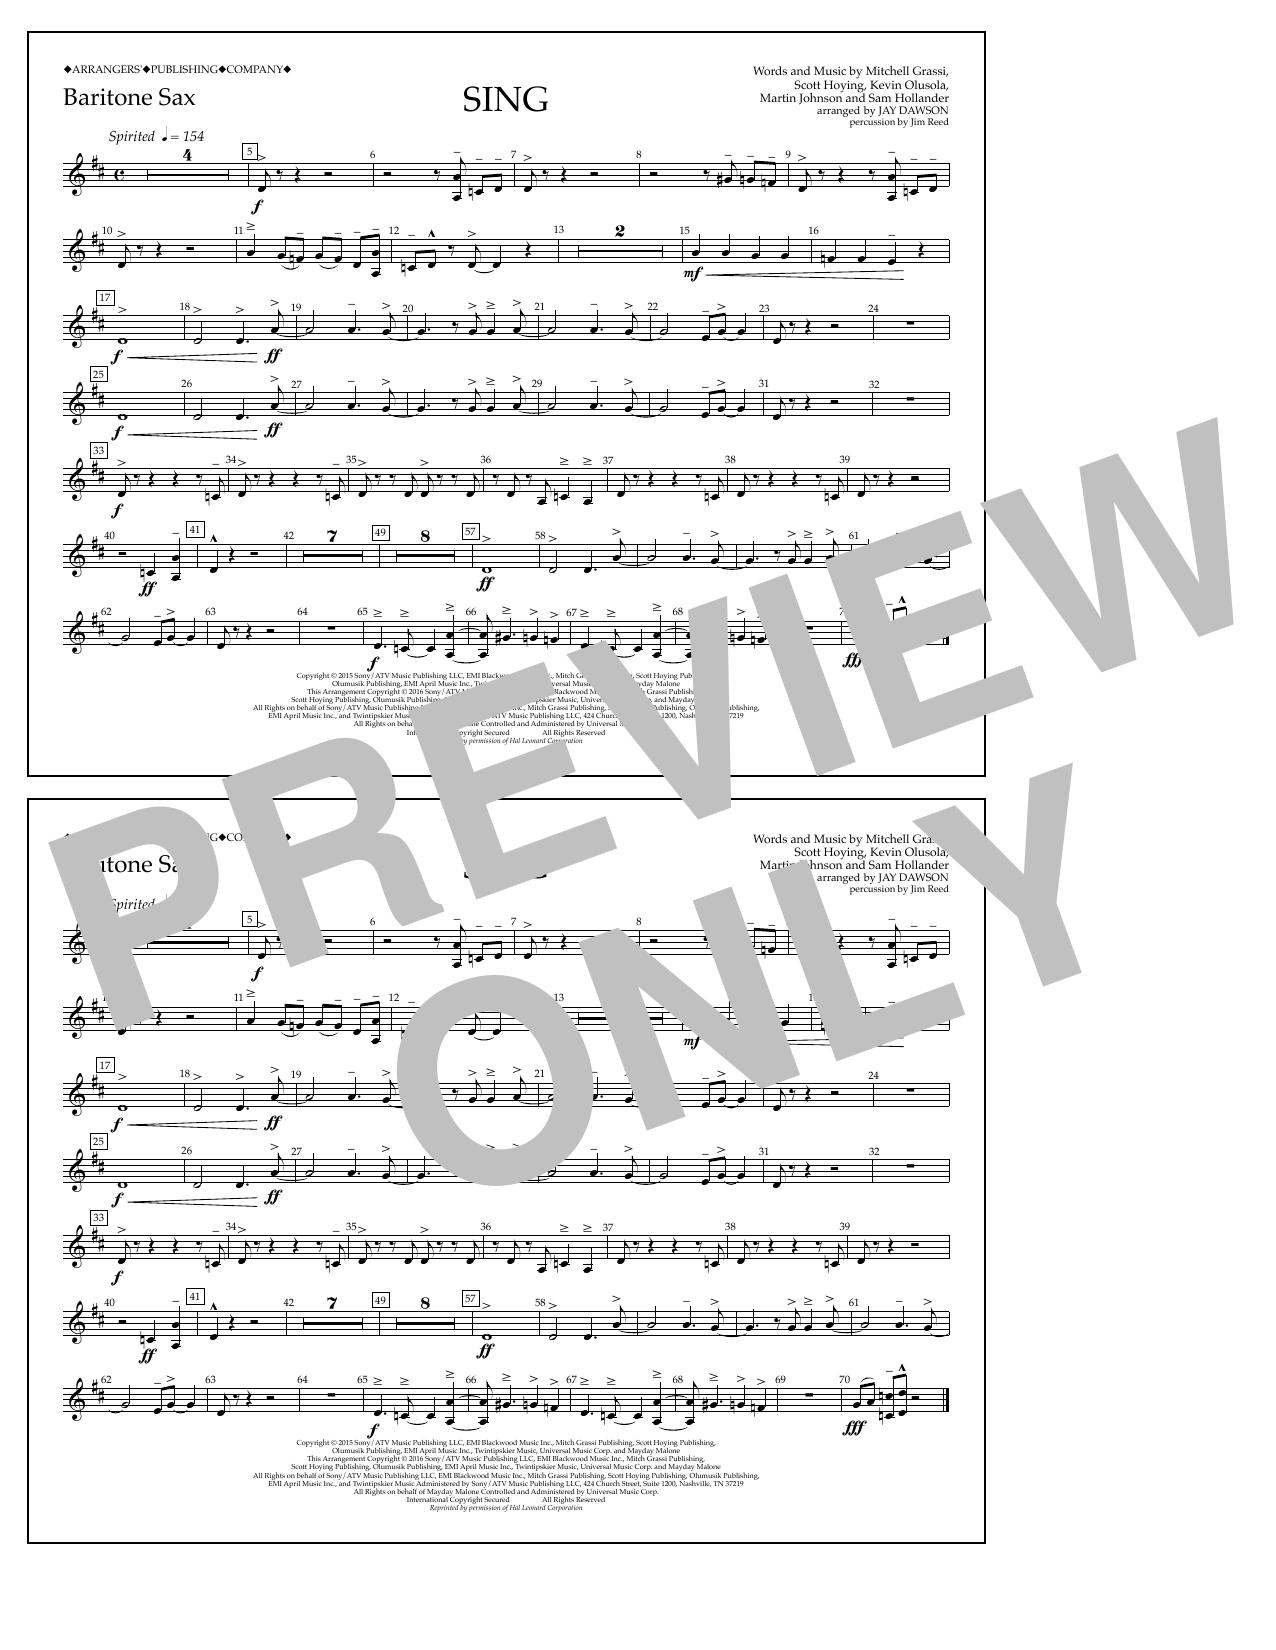 Pentatonix - Sing - Baritone Sax